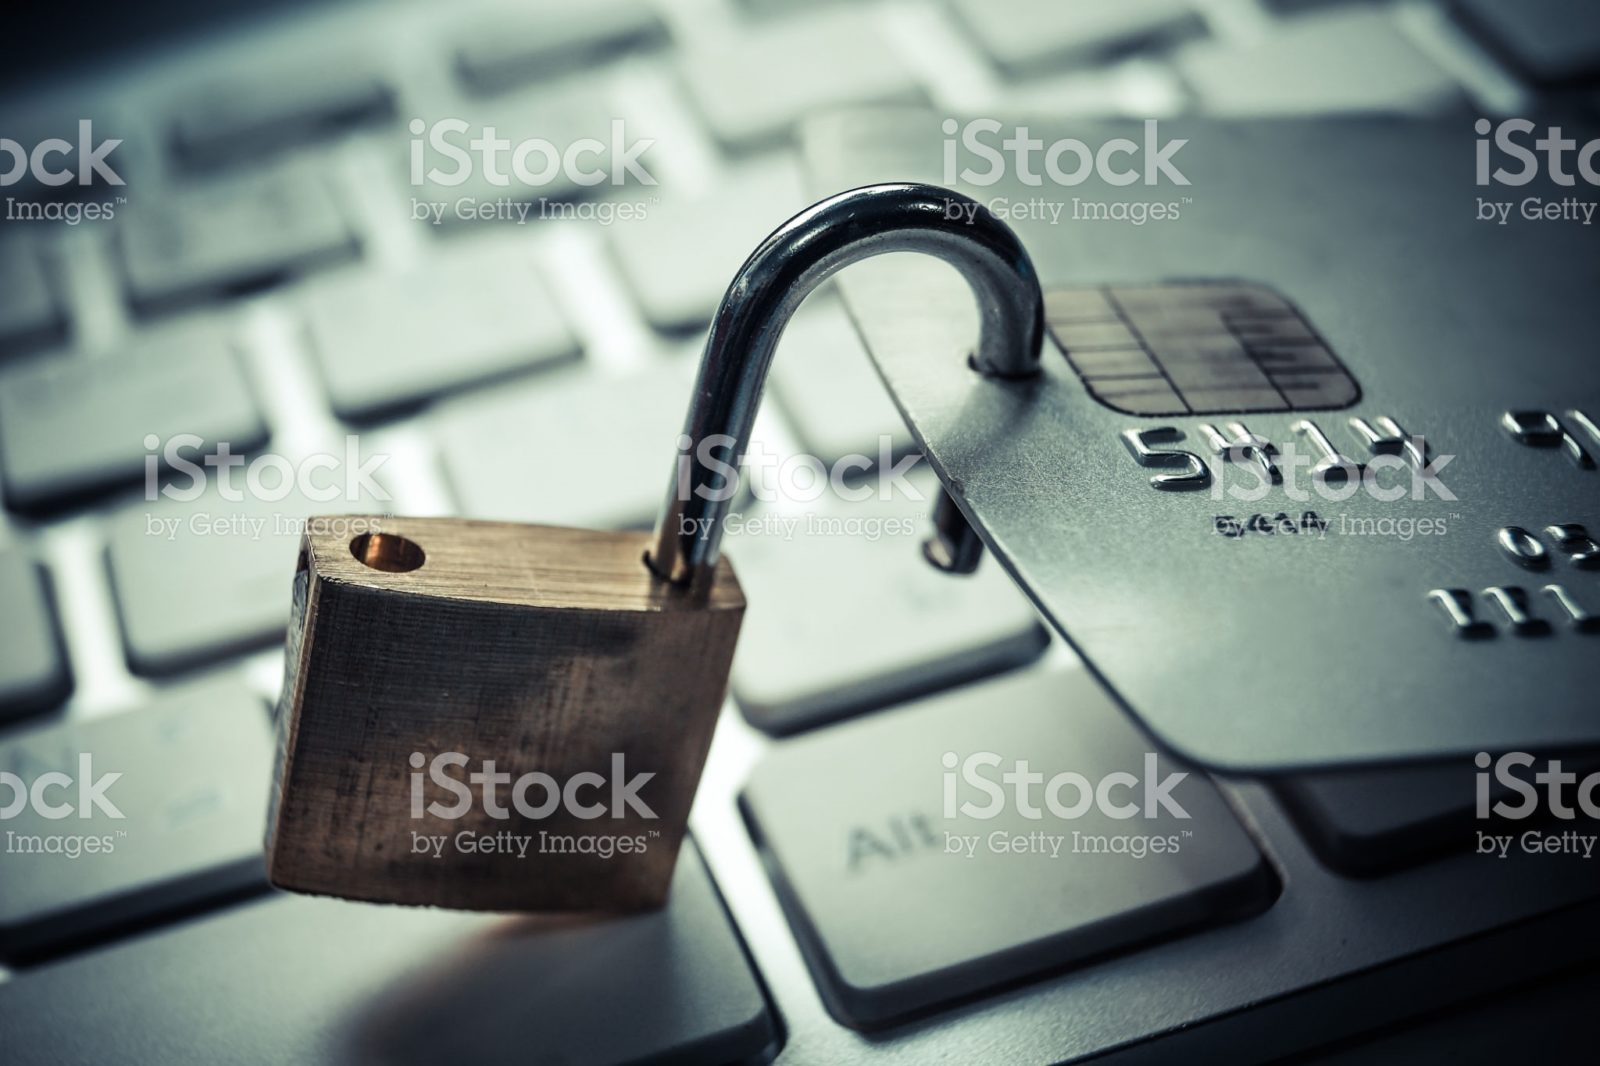 Credit card with unlocked padlock